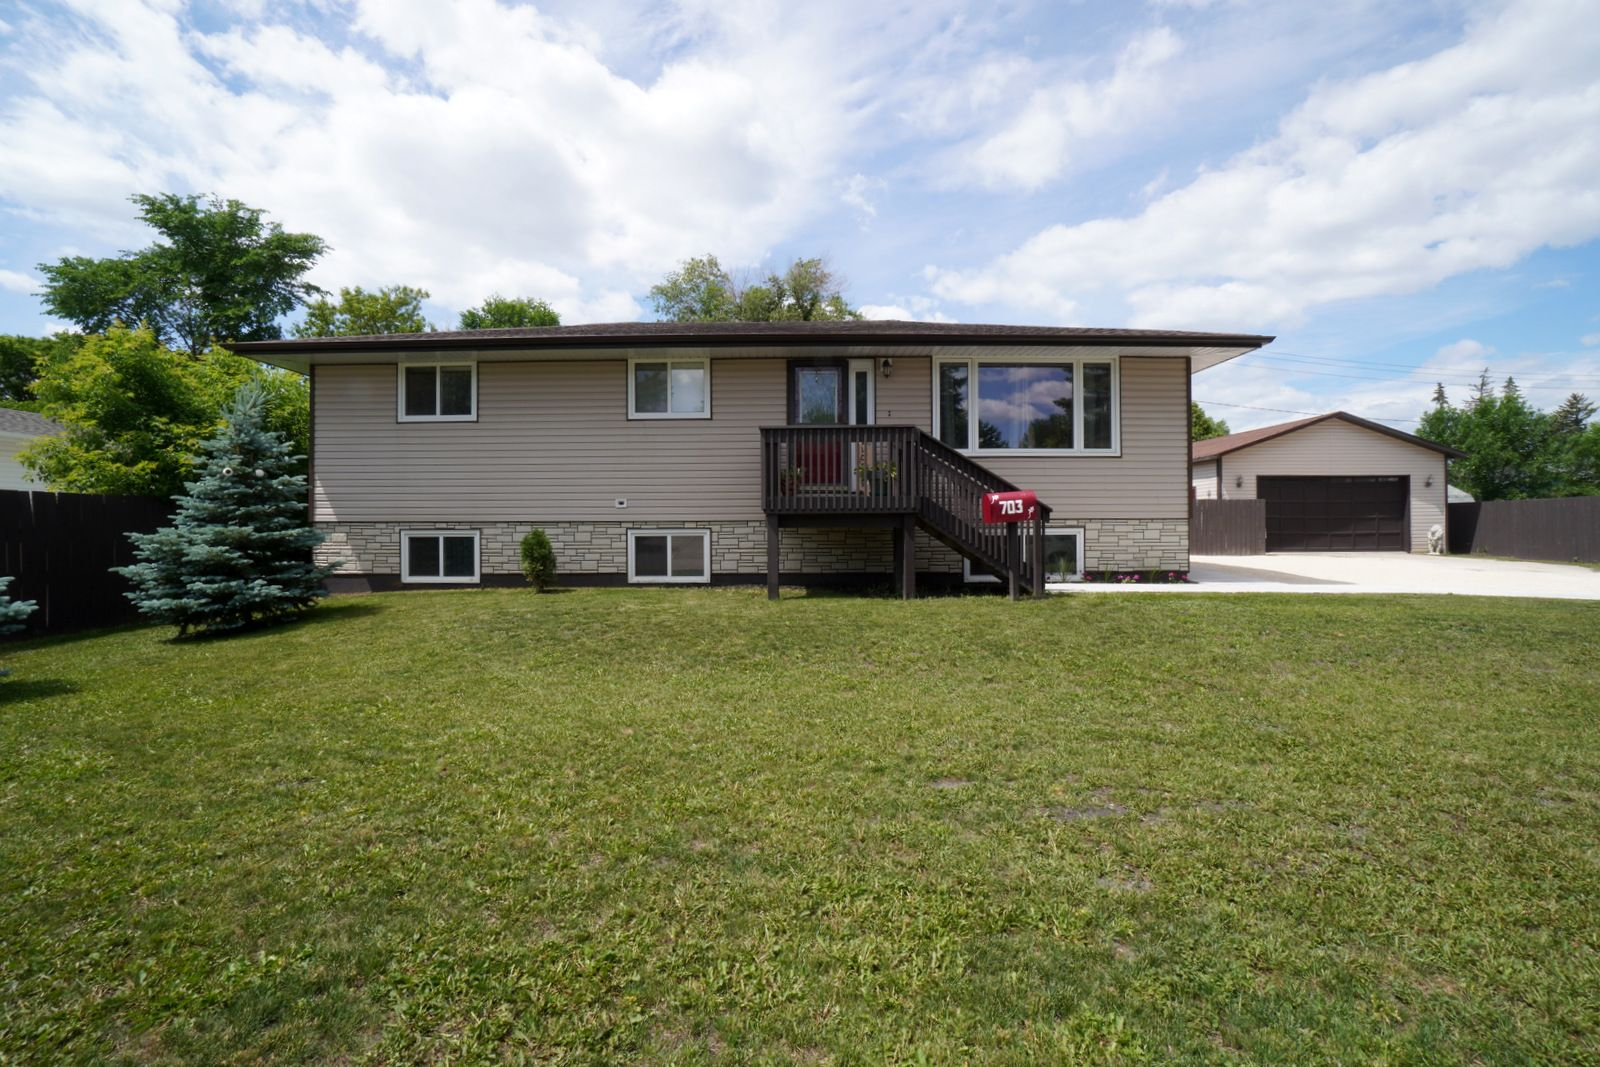 Main Photo: 703 4th Street NE in Portage la Prairie: House for sale : MLS®# 202115922